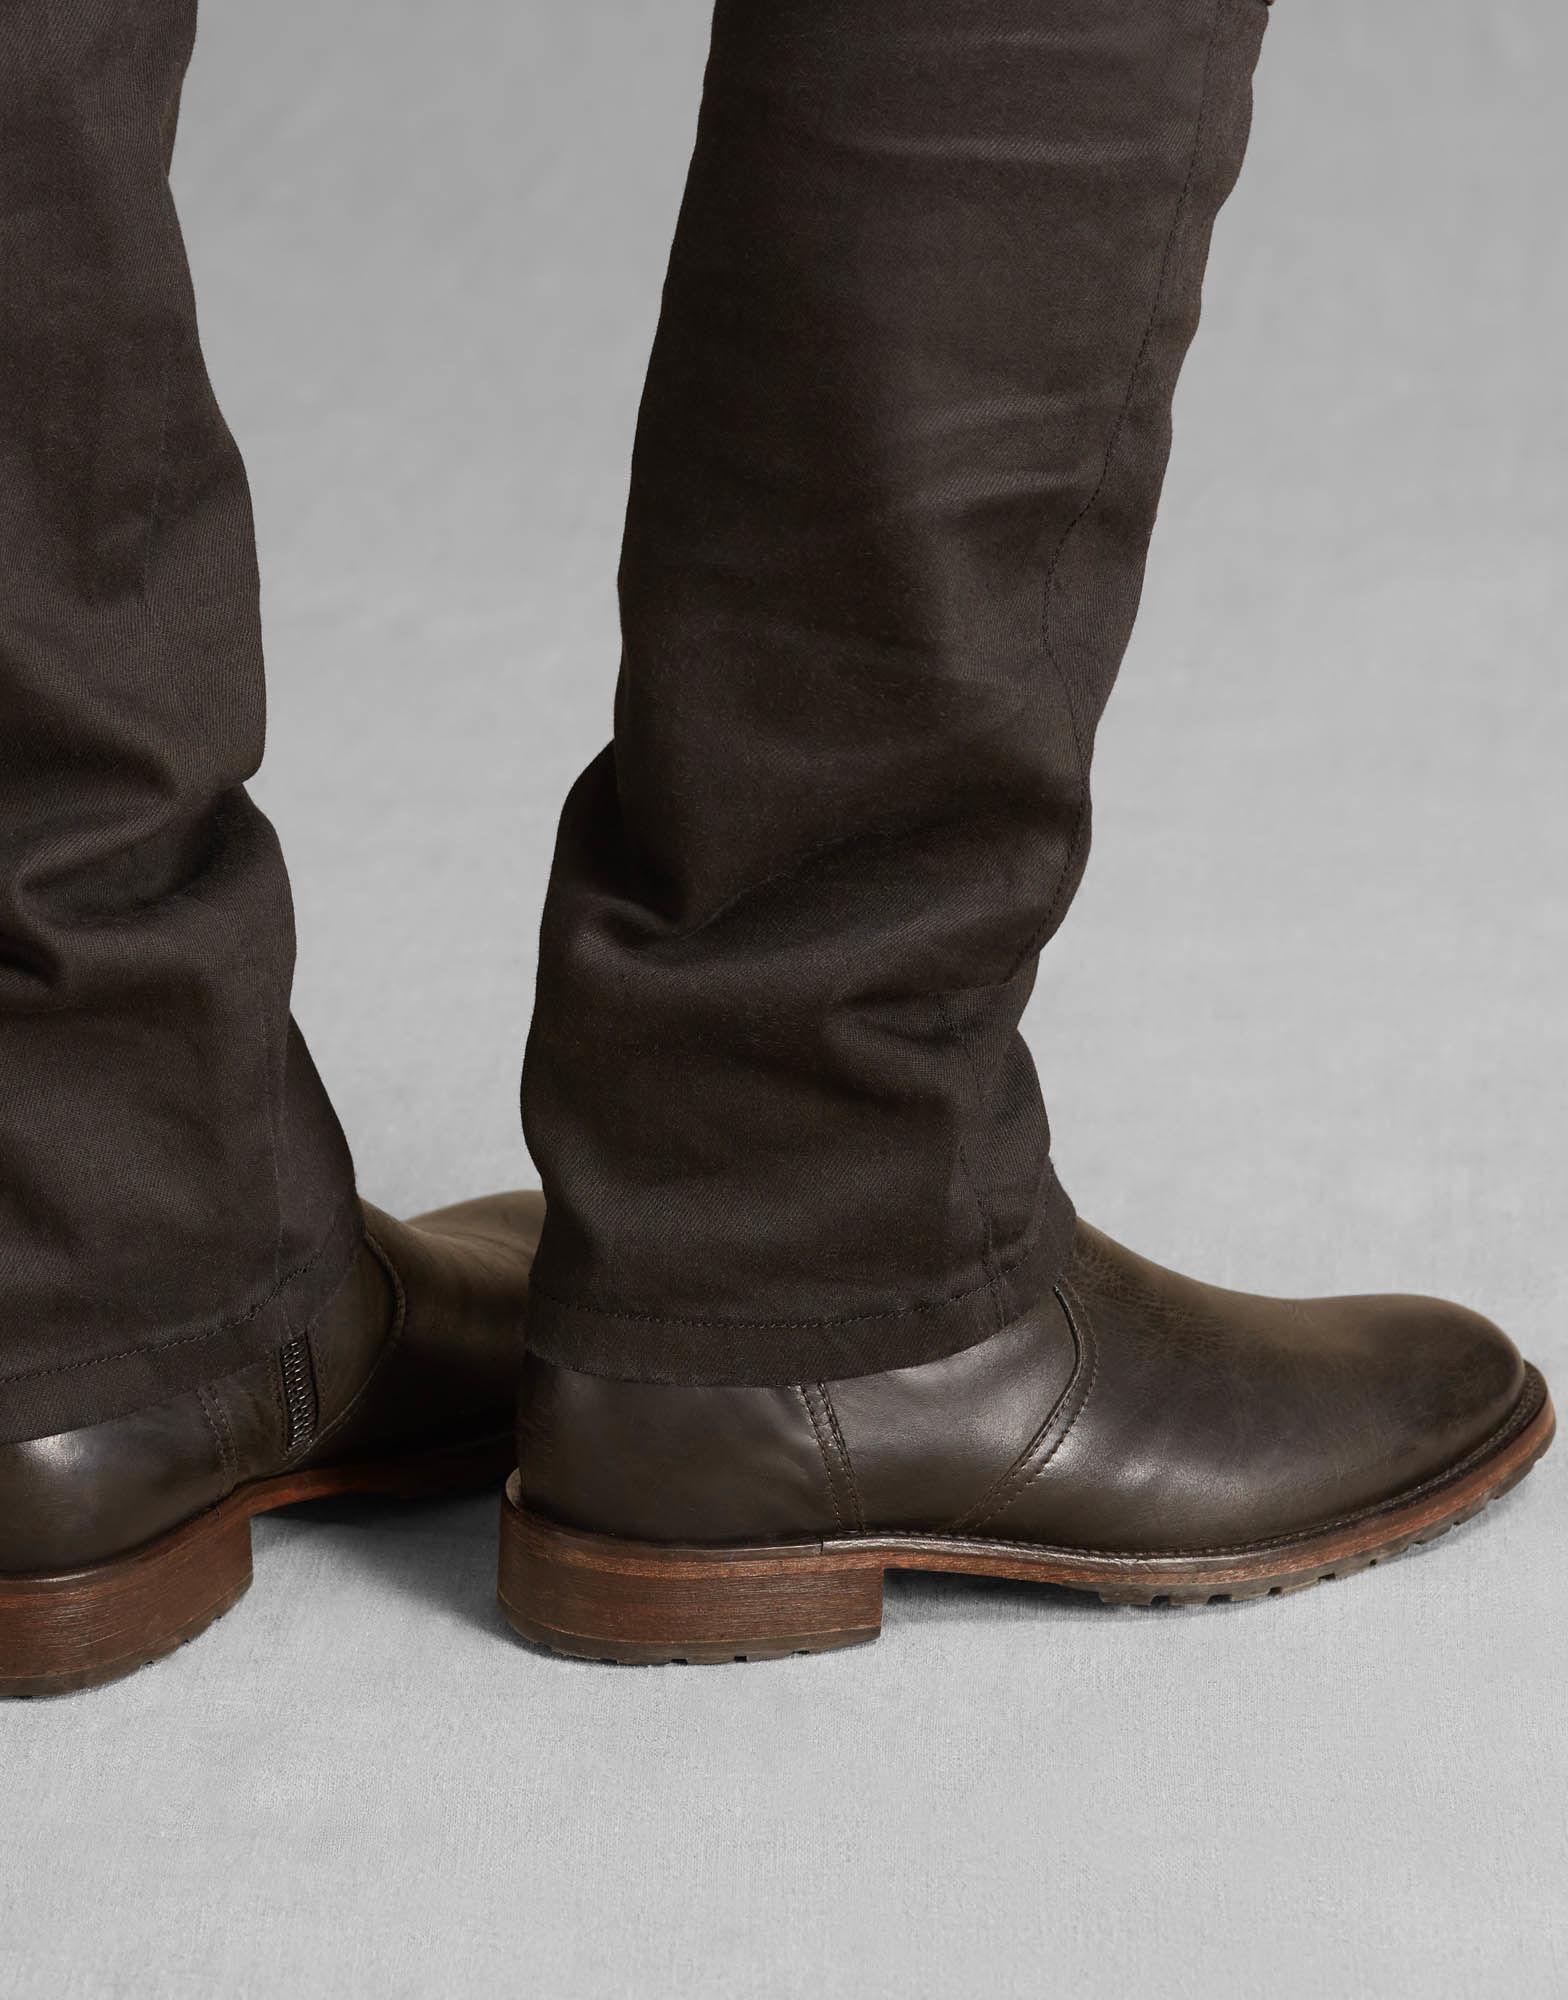 FOOTWEAR - Ankle boots Belstaff cyFyu